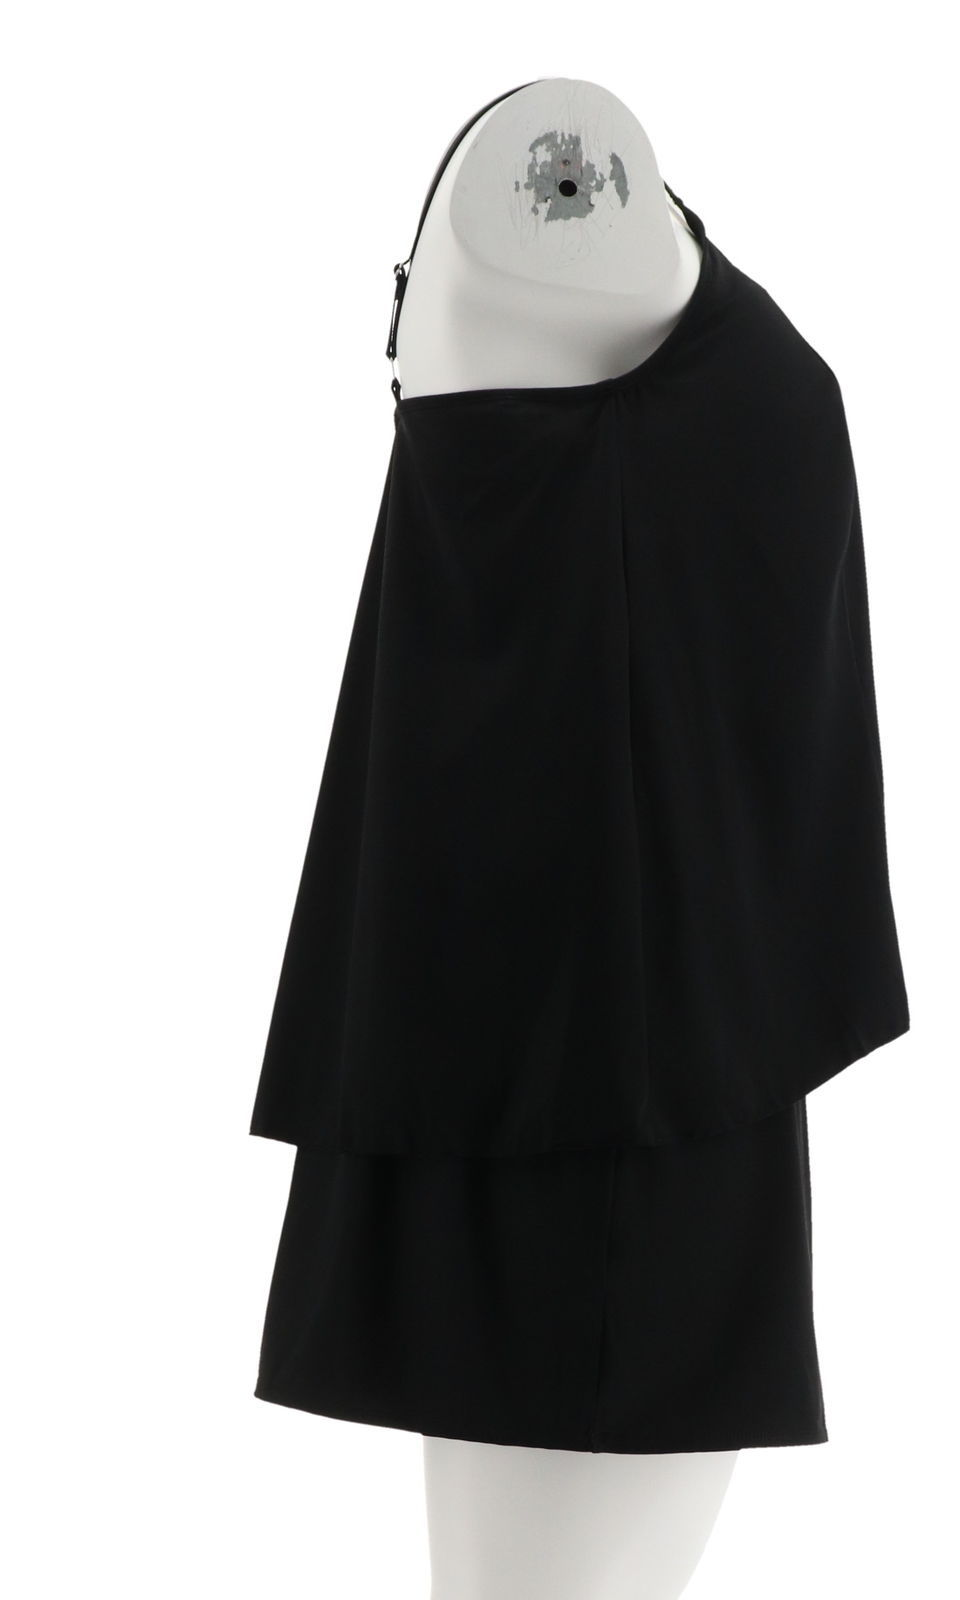 Denim& Co Beach Hi-Low Tankini Swimsuit Skirt Black 12 NEW A303155